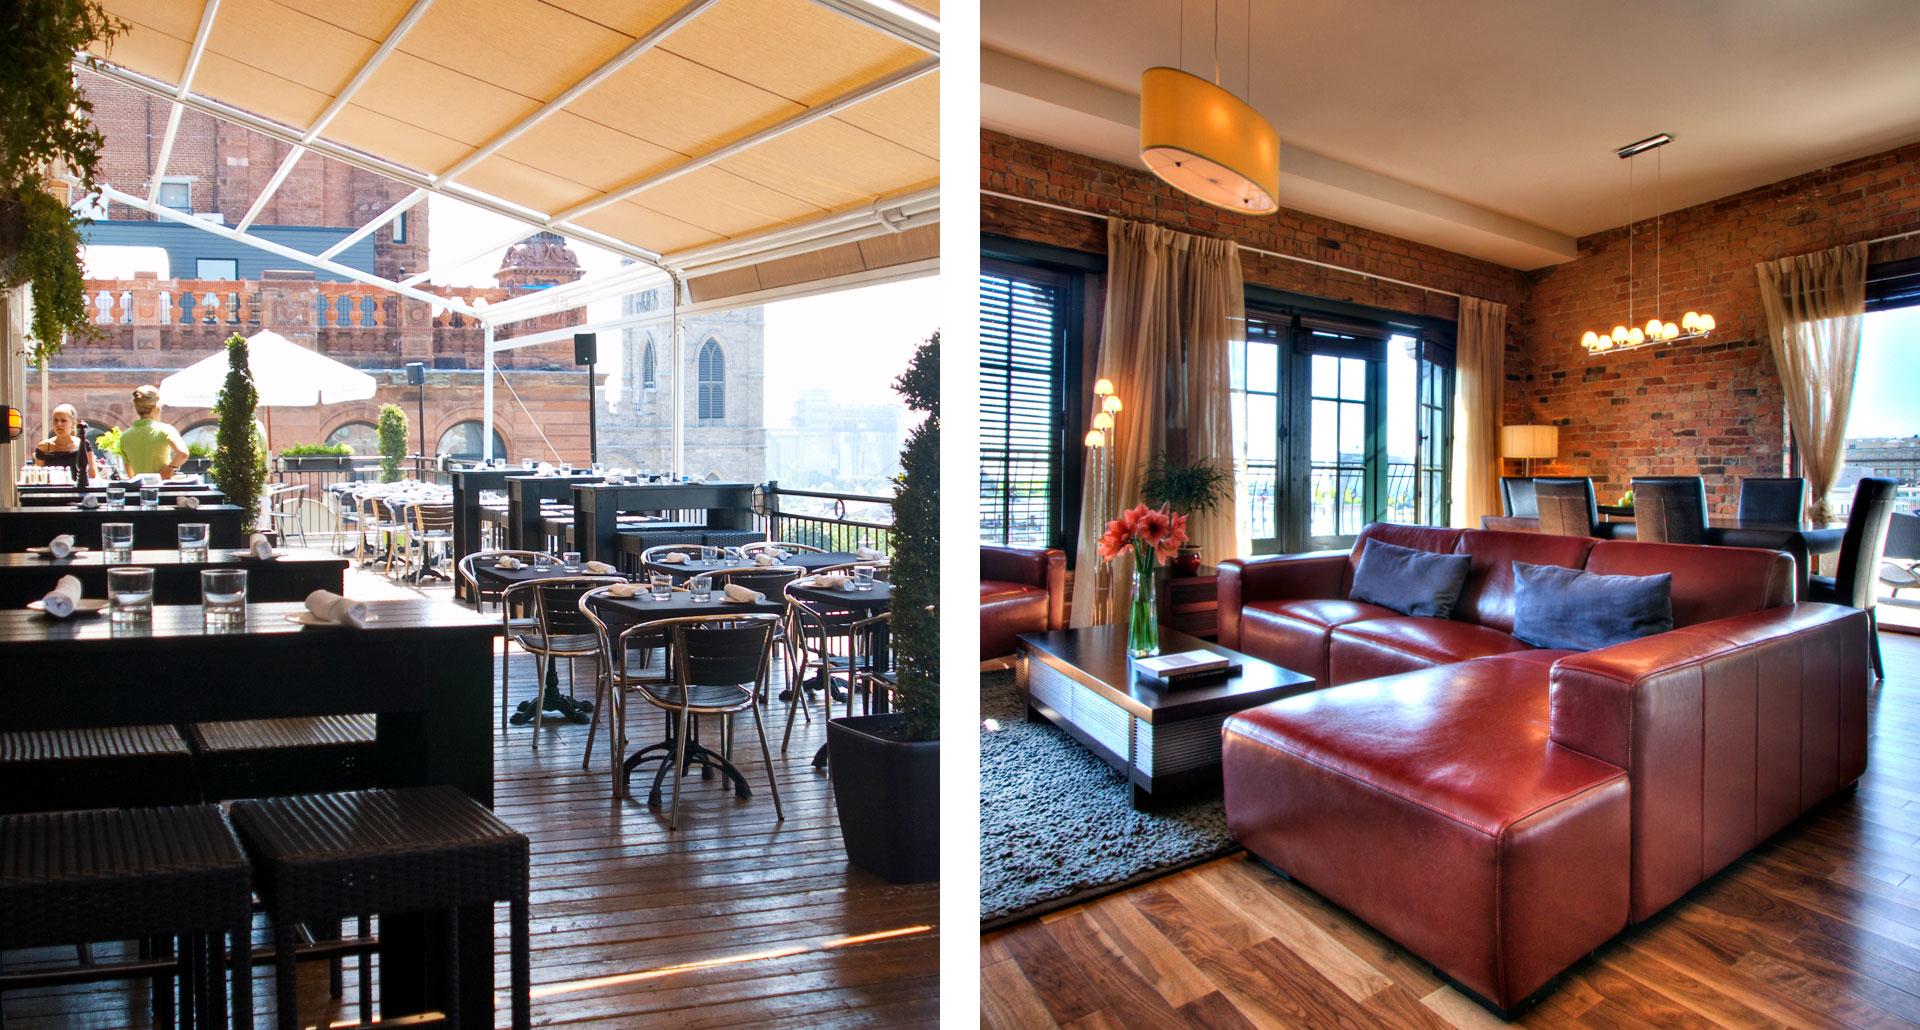 Le Place d'Armes Hotel & Suites - boutique hotel in Montreal